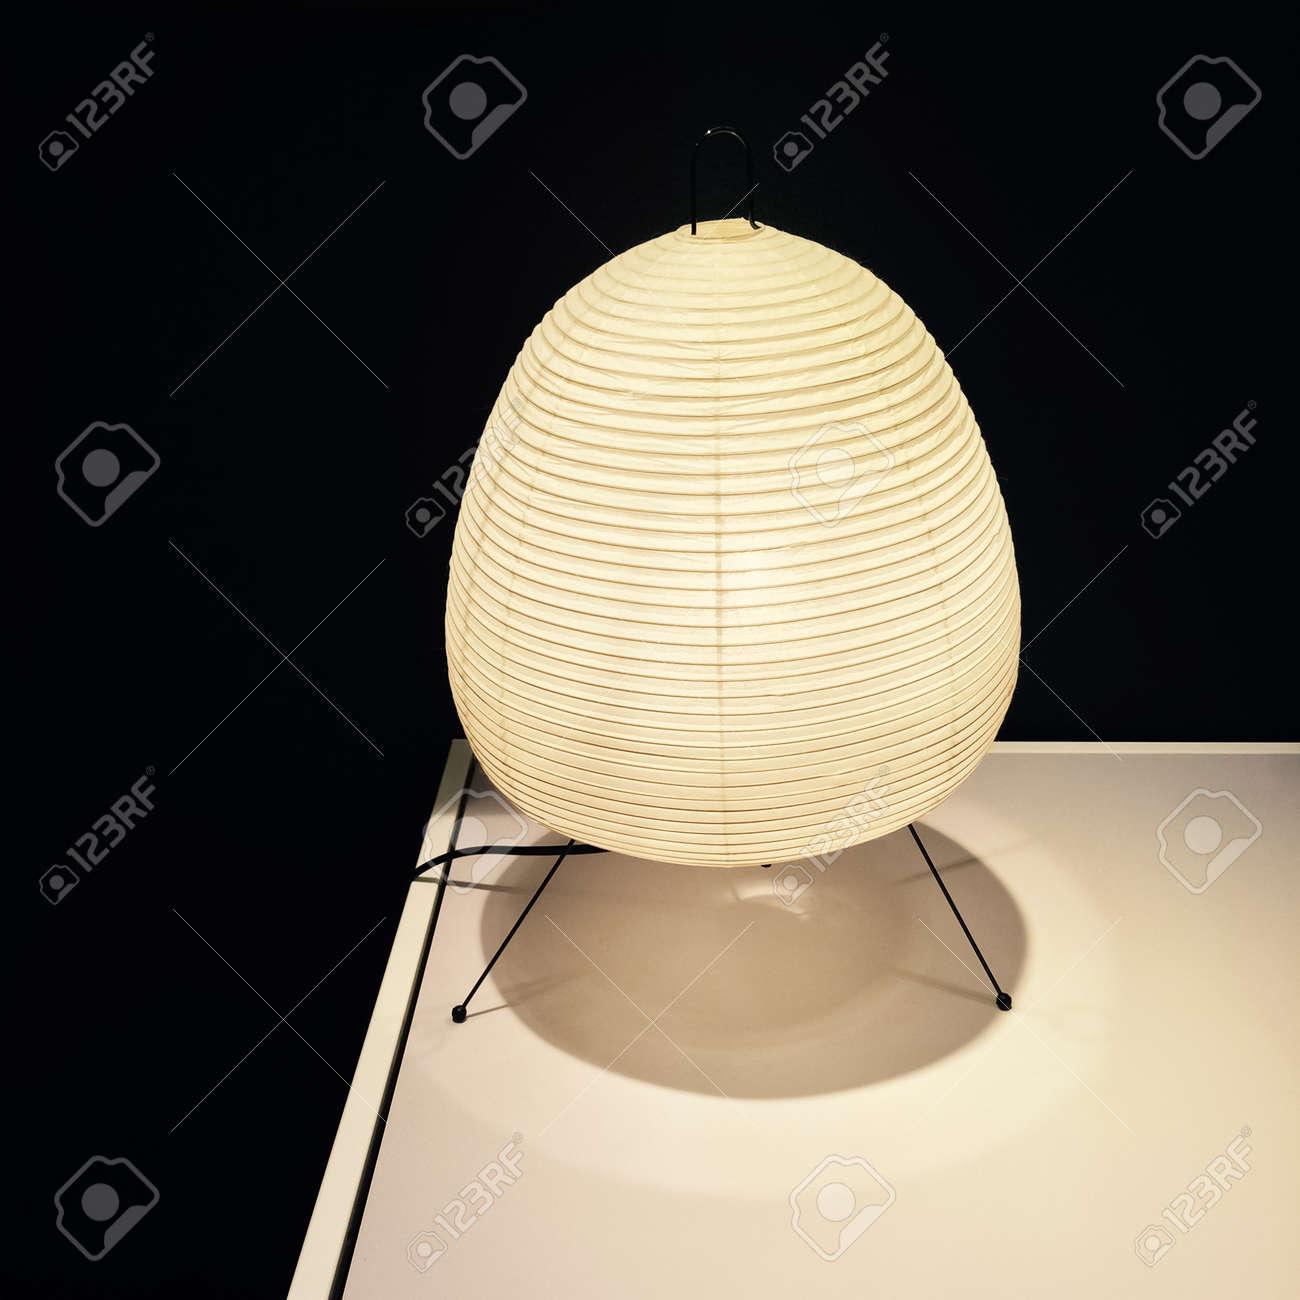 Lampe Papier De Riz Lampe Papier Ikea